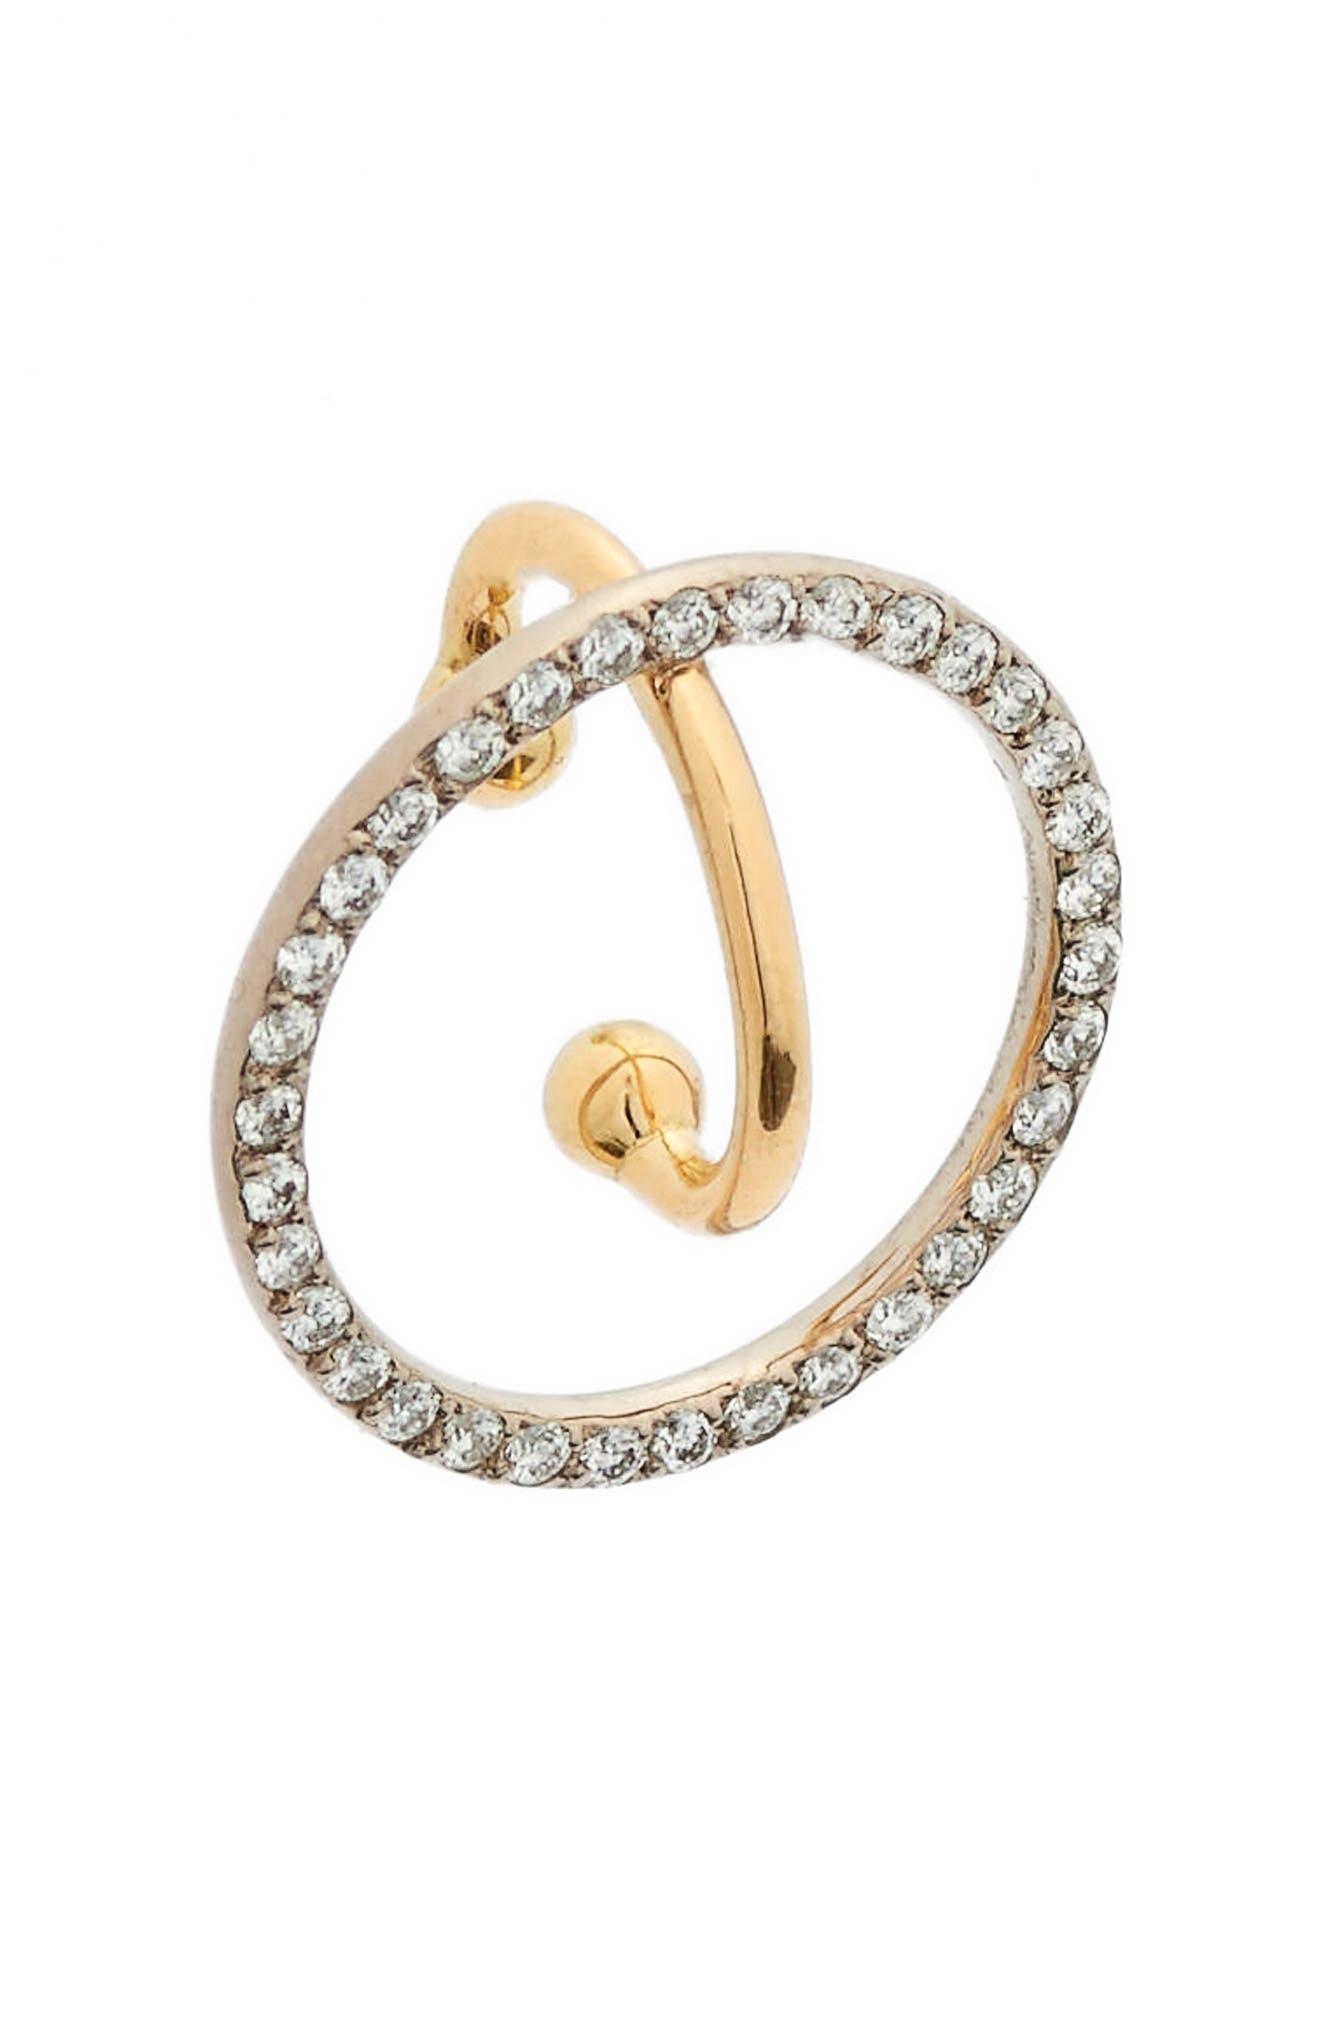 Celeste Diamond Earring,                             Main thumbnail 1, color,                             Yellow White Gold Diamonds